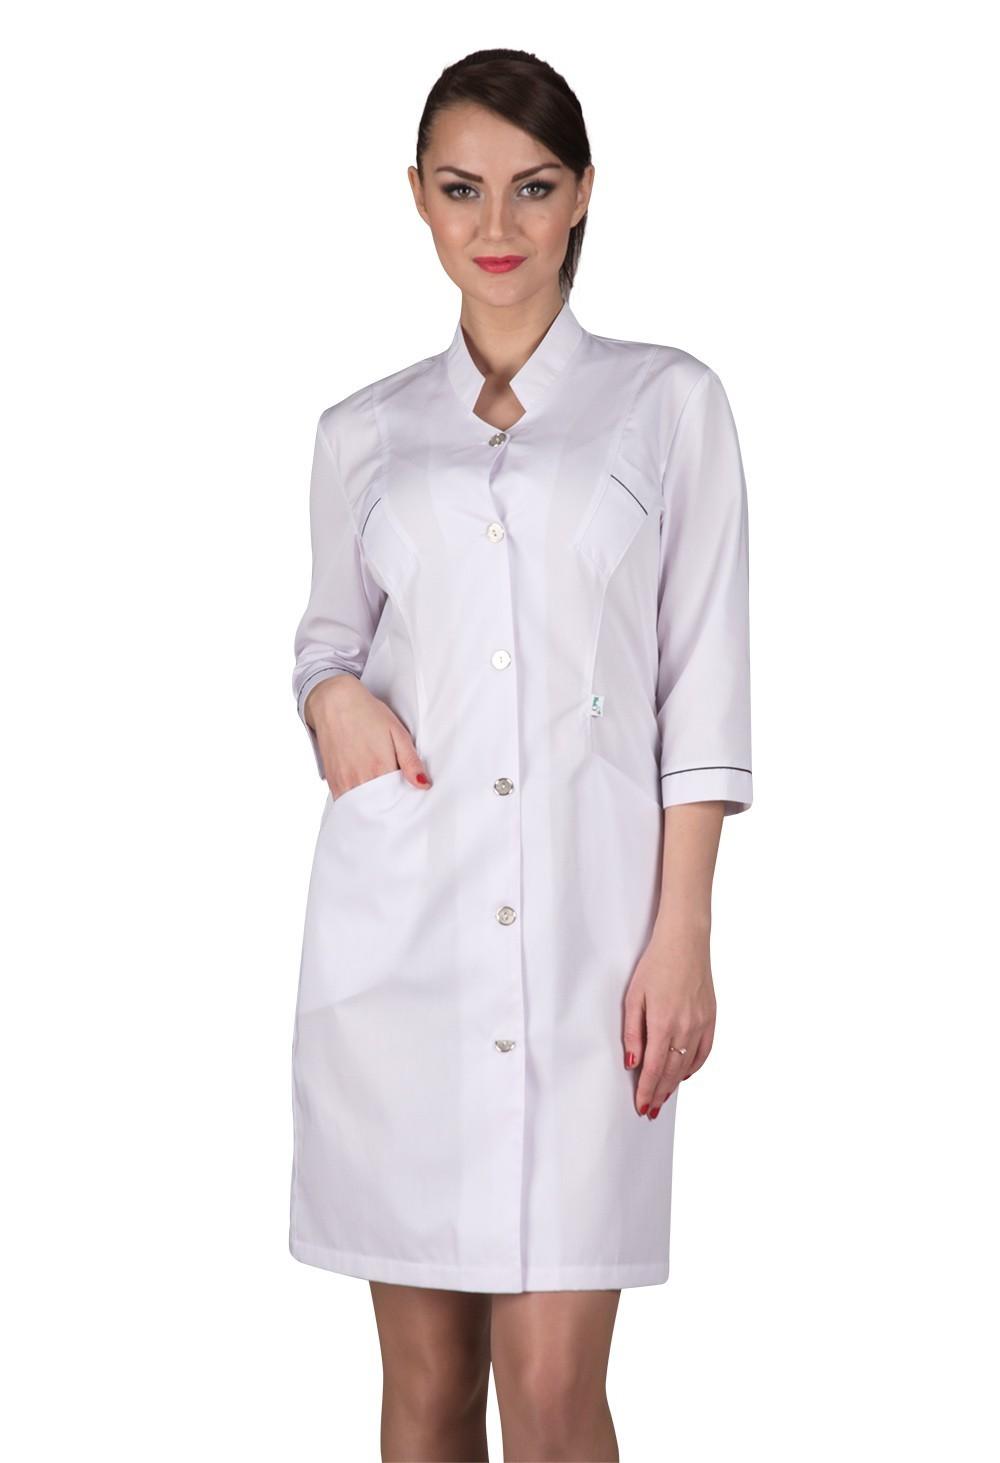 Медицинский женский халат Х-226 сатори